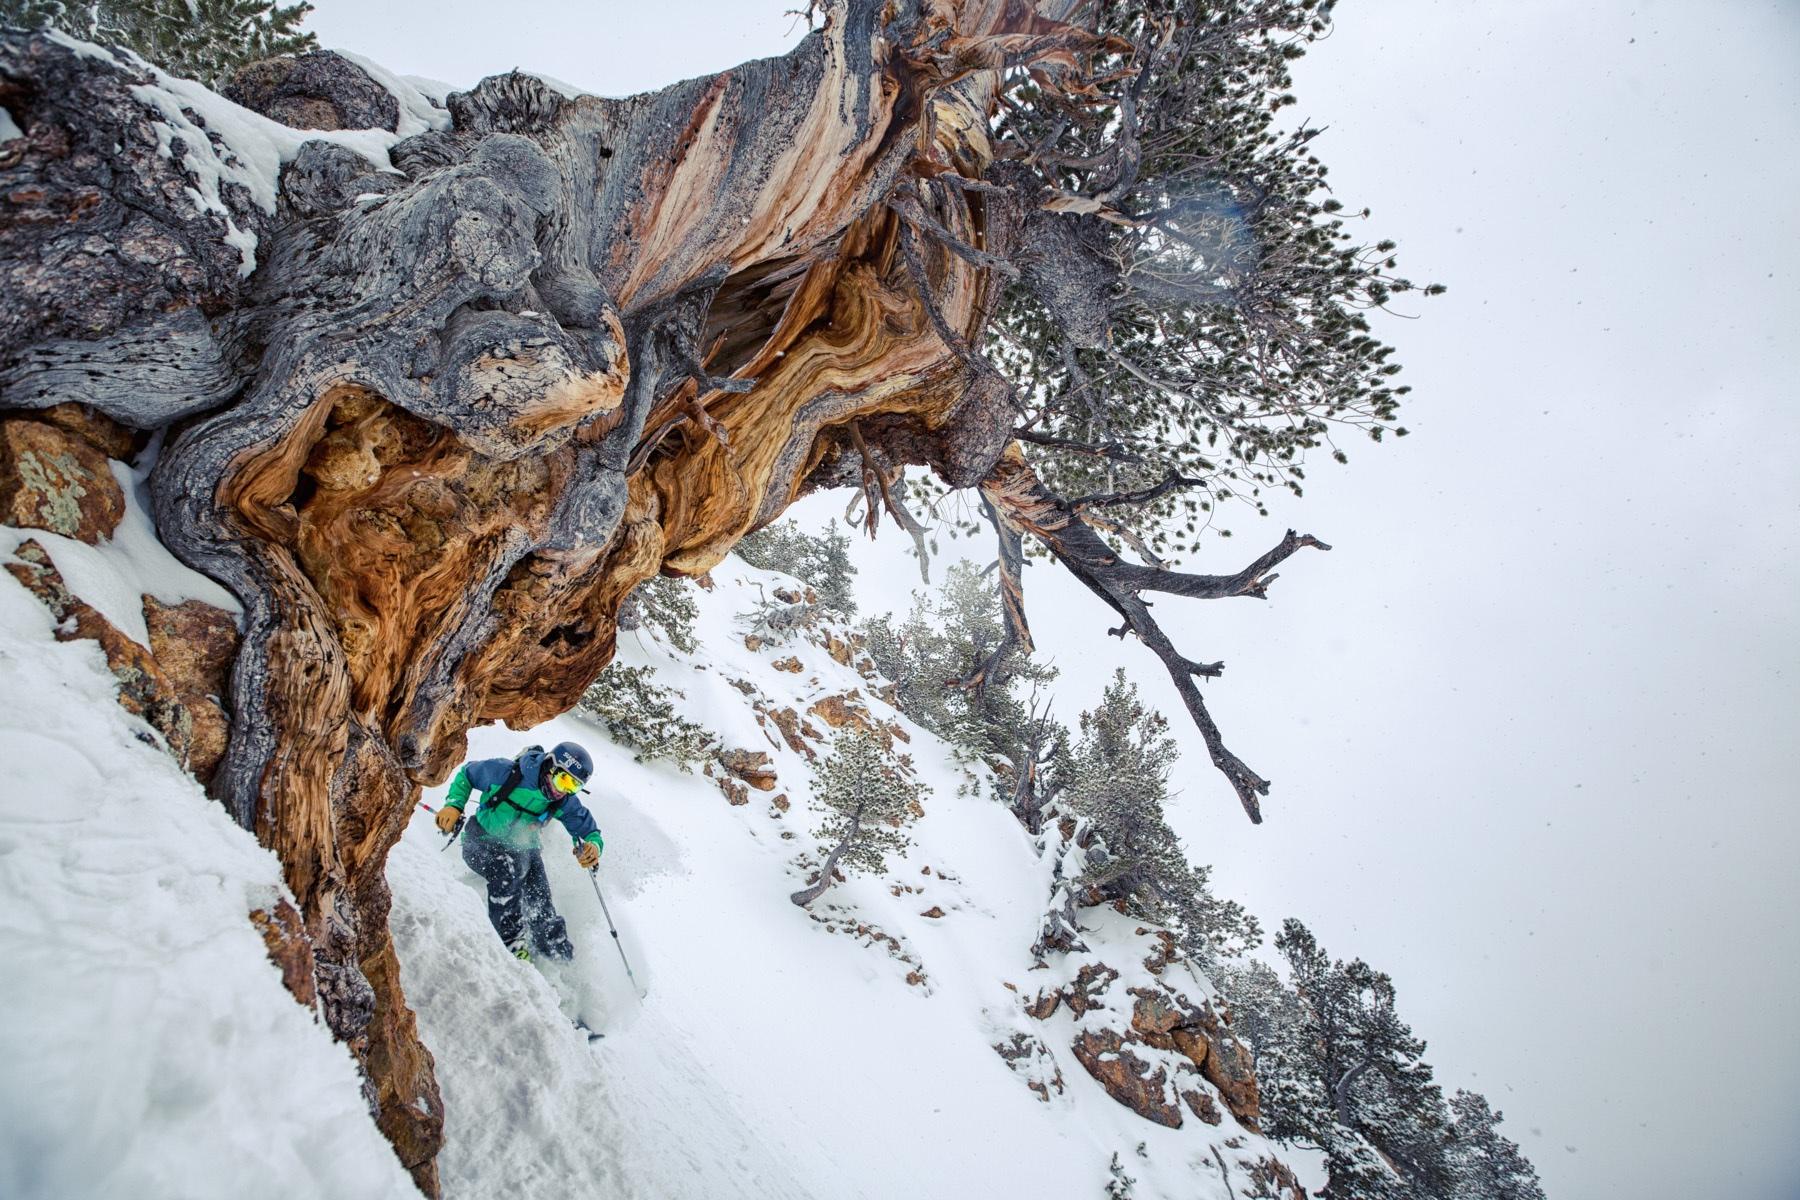 photo  Jim Harris  location  Wasatch Mountains, Utah